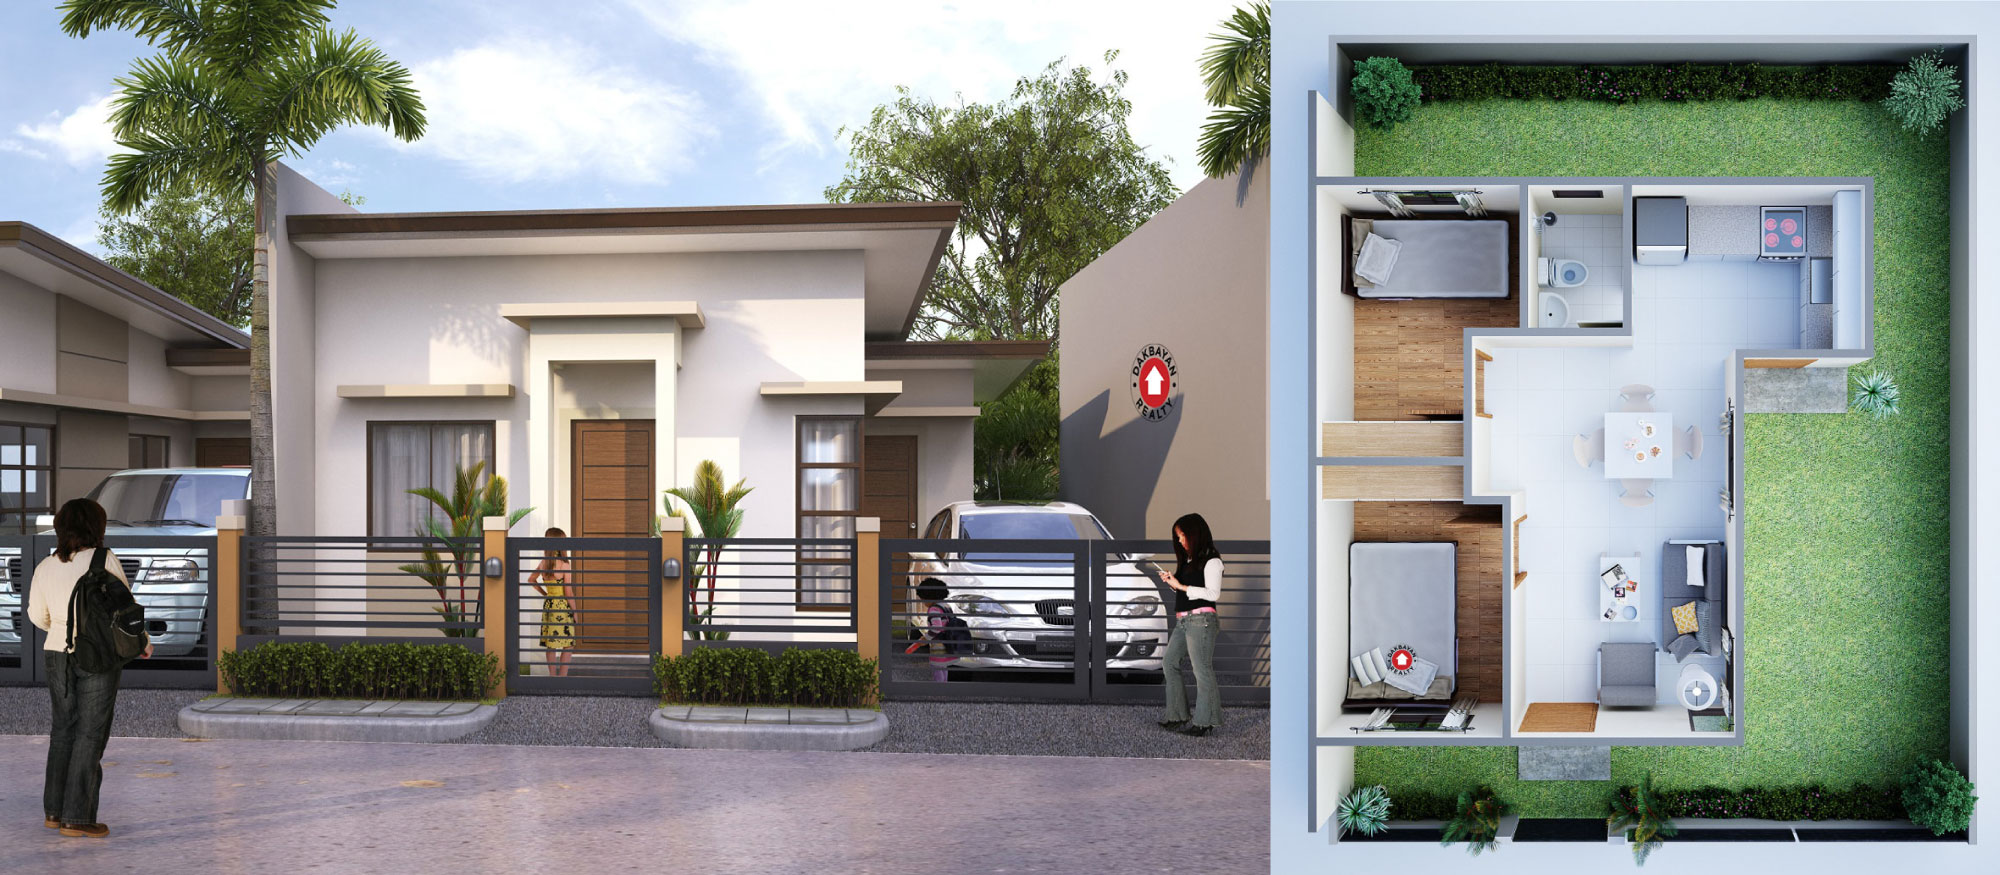 granville crest gabriel model house